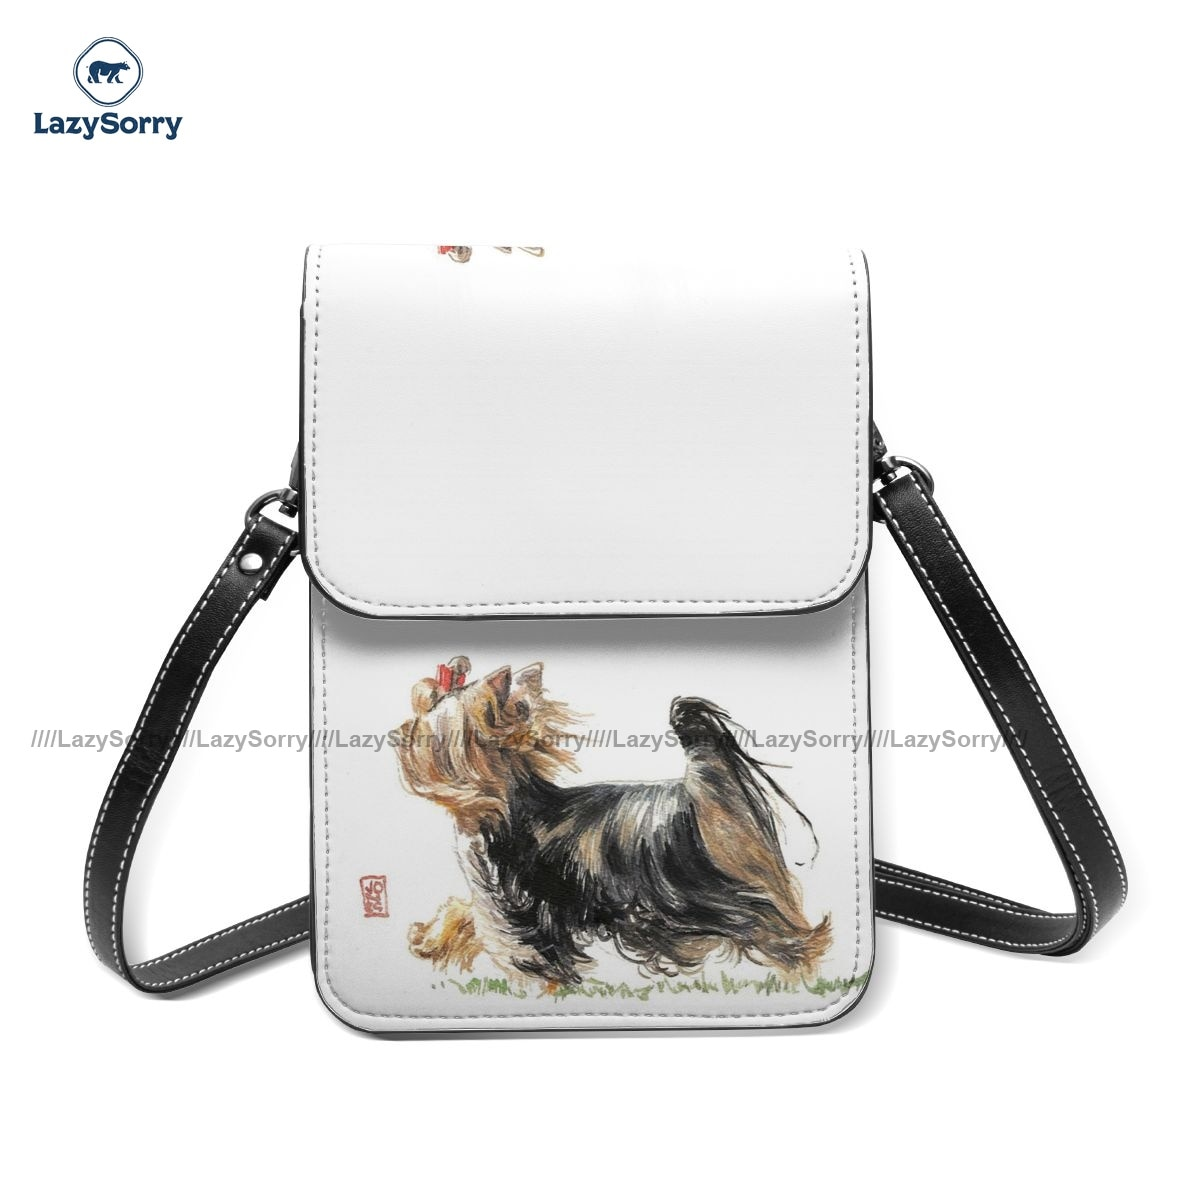 Yorkshire Terrier Shoulder Bag Shopping Leather Mobile Phone Bag Female Bulk Funny Bags